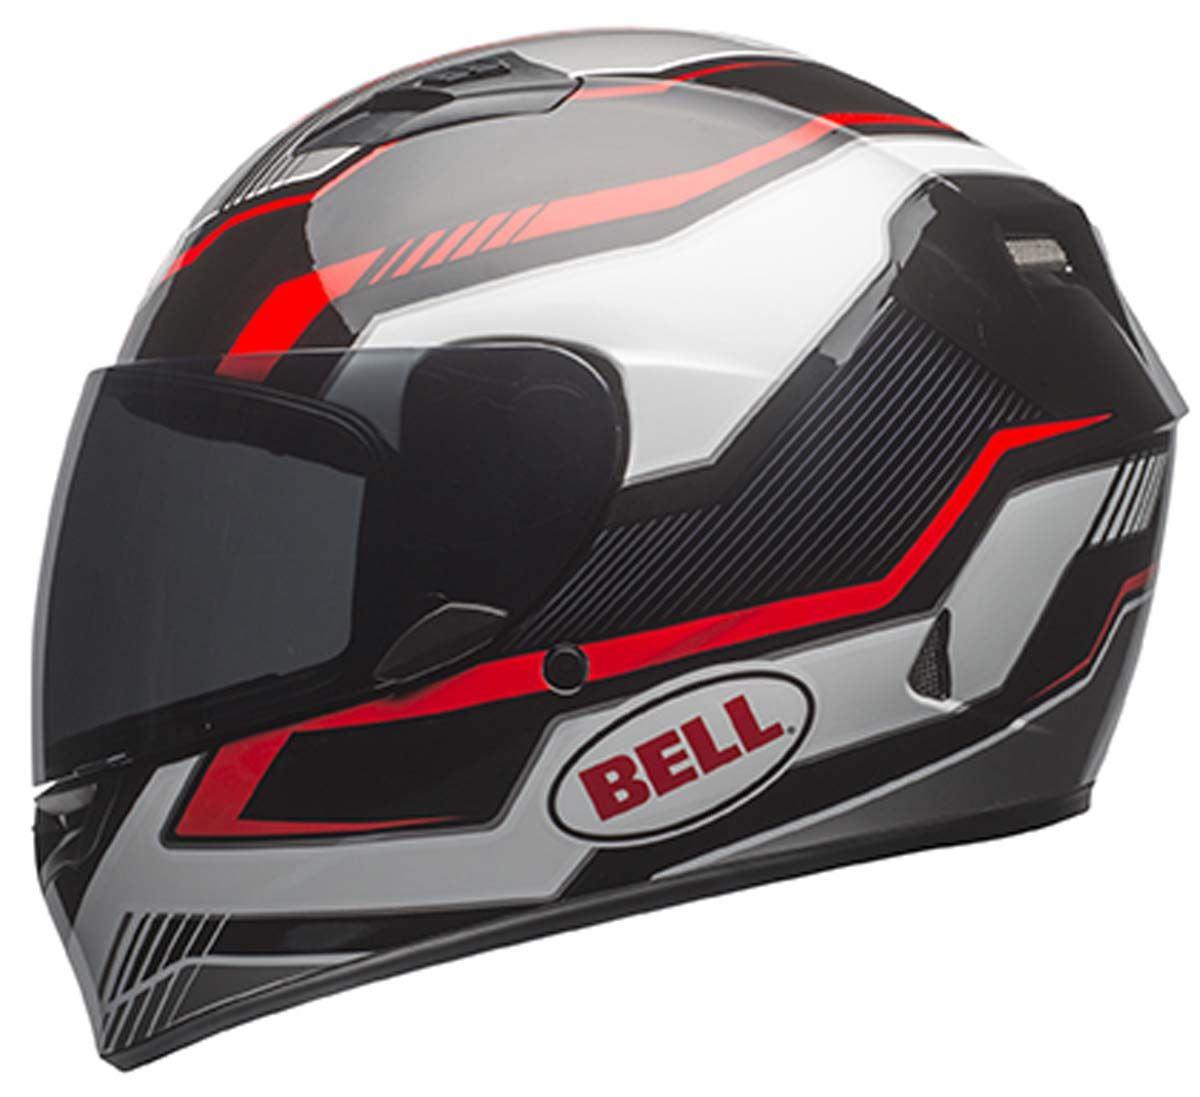 Bell-Qualifier-Helmet-Full-Face-Motorcycle-Clear-Shield-DOT-XS-3XL miniature 14